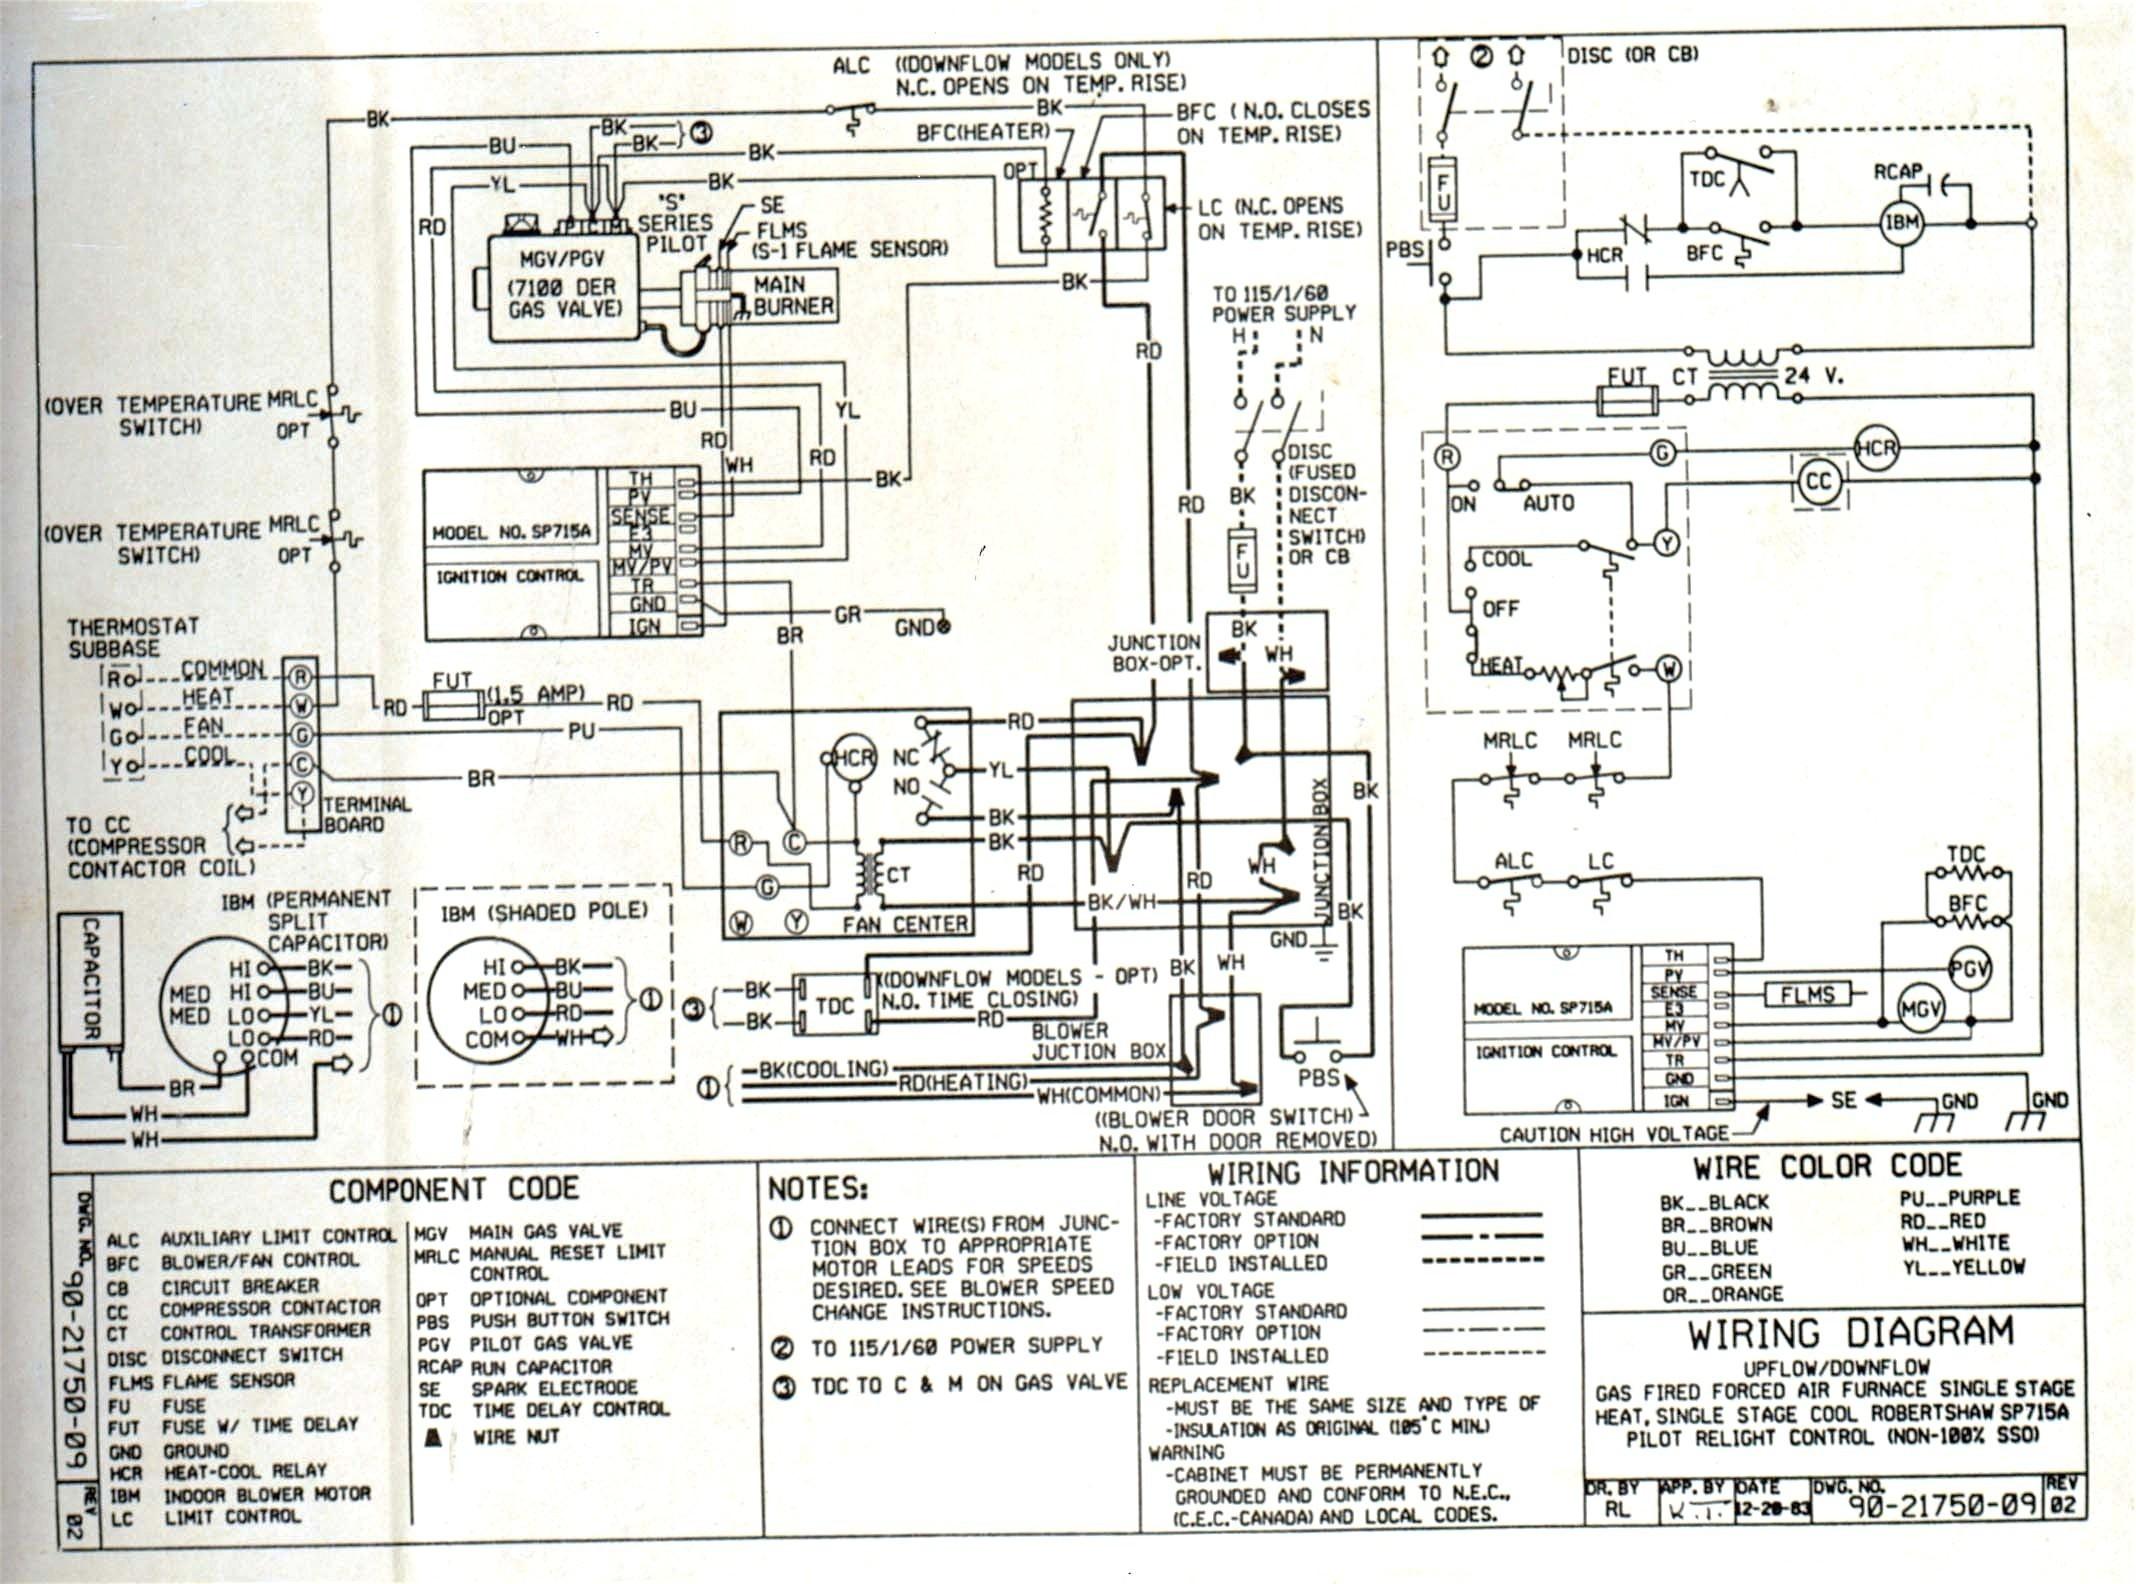 Toyota Previa Engine Diagram Wiring Diagram Alternator ... on